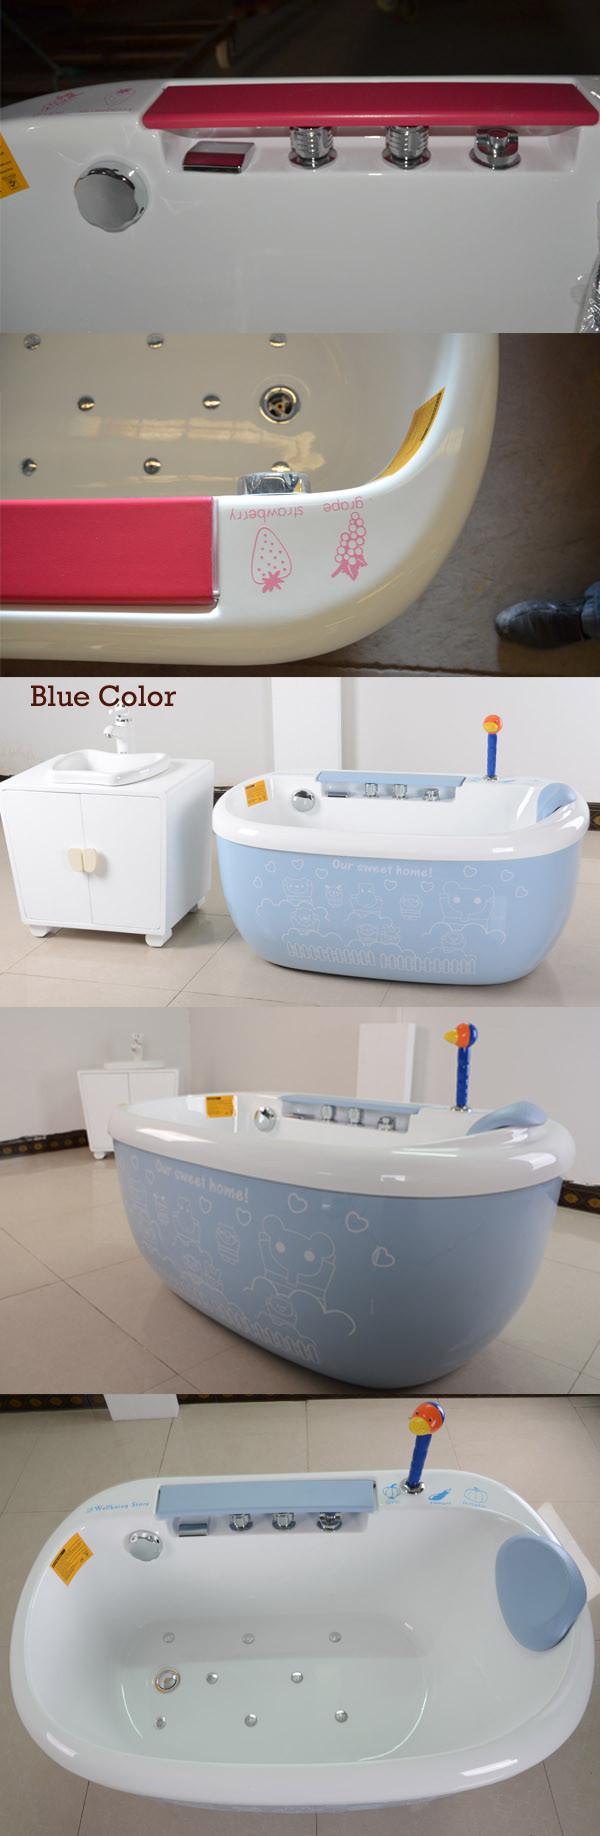 hs b01 child size freestanding baby bath tub buy. Black Bedroom Furniture Sets. Home Design Ideas